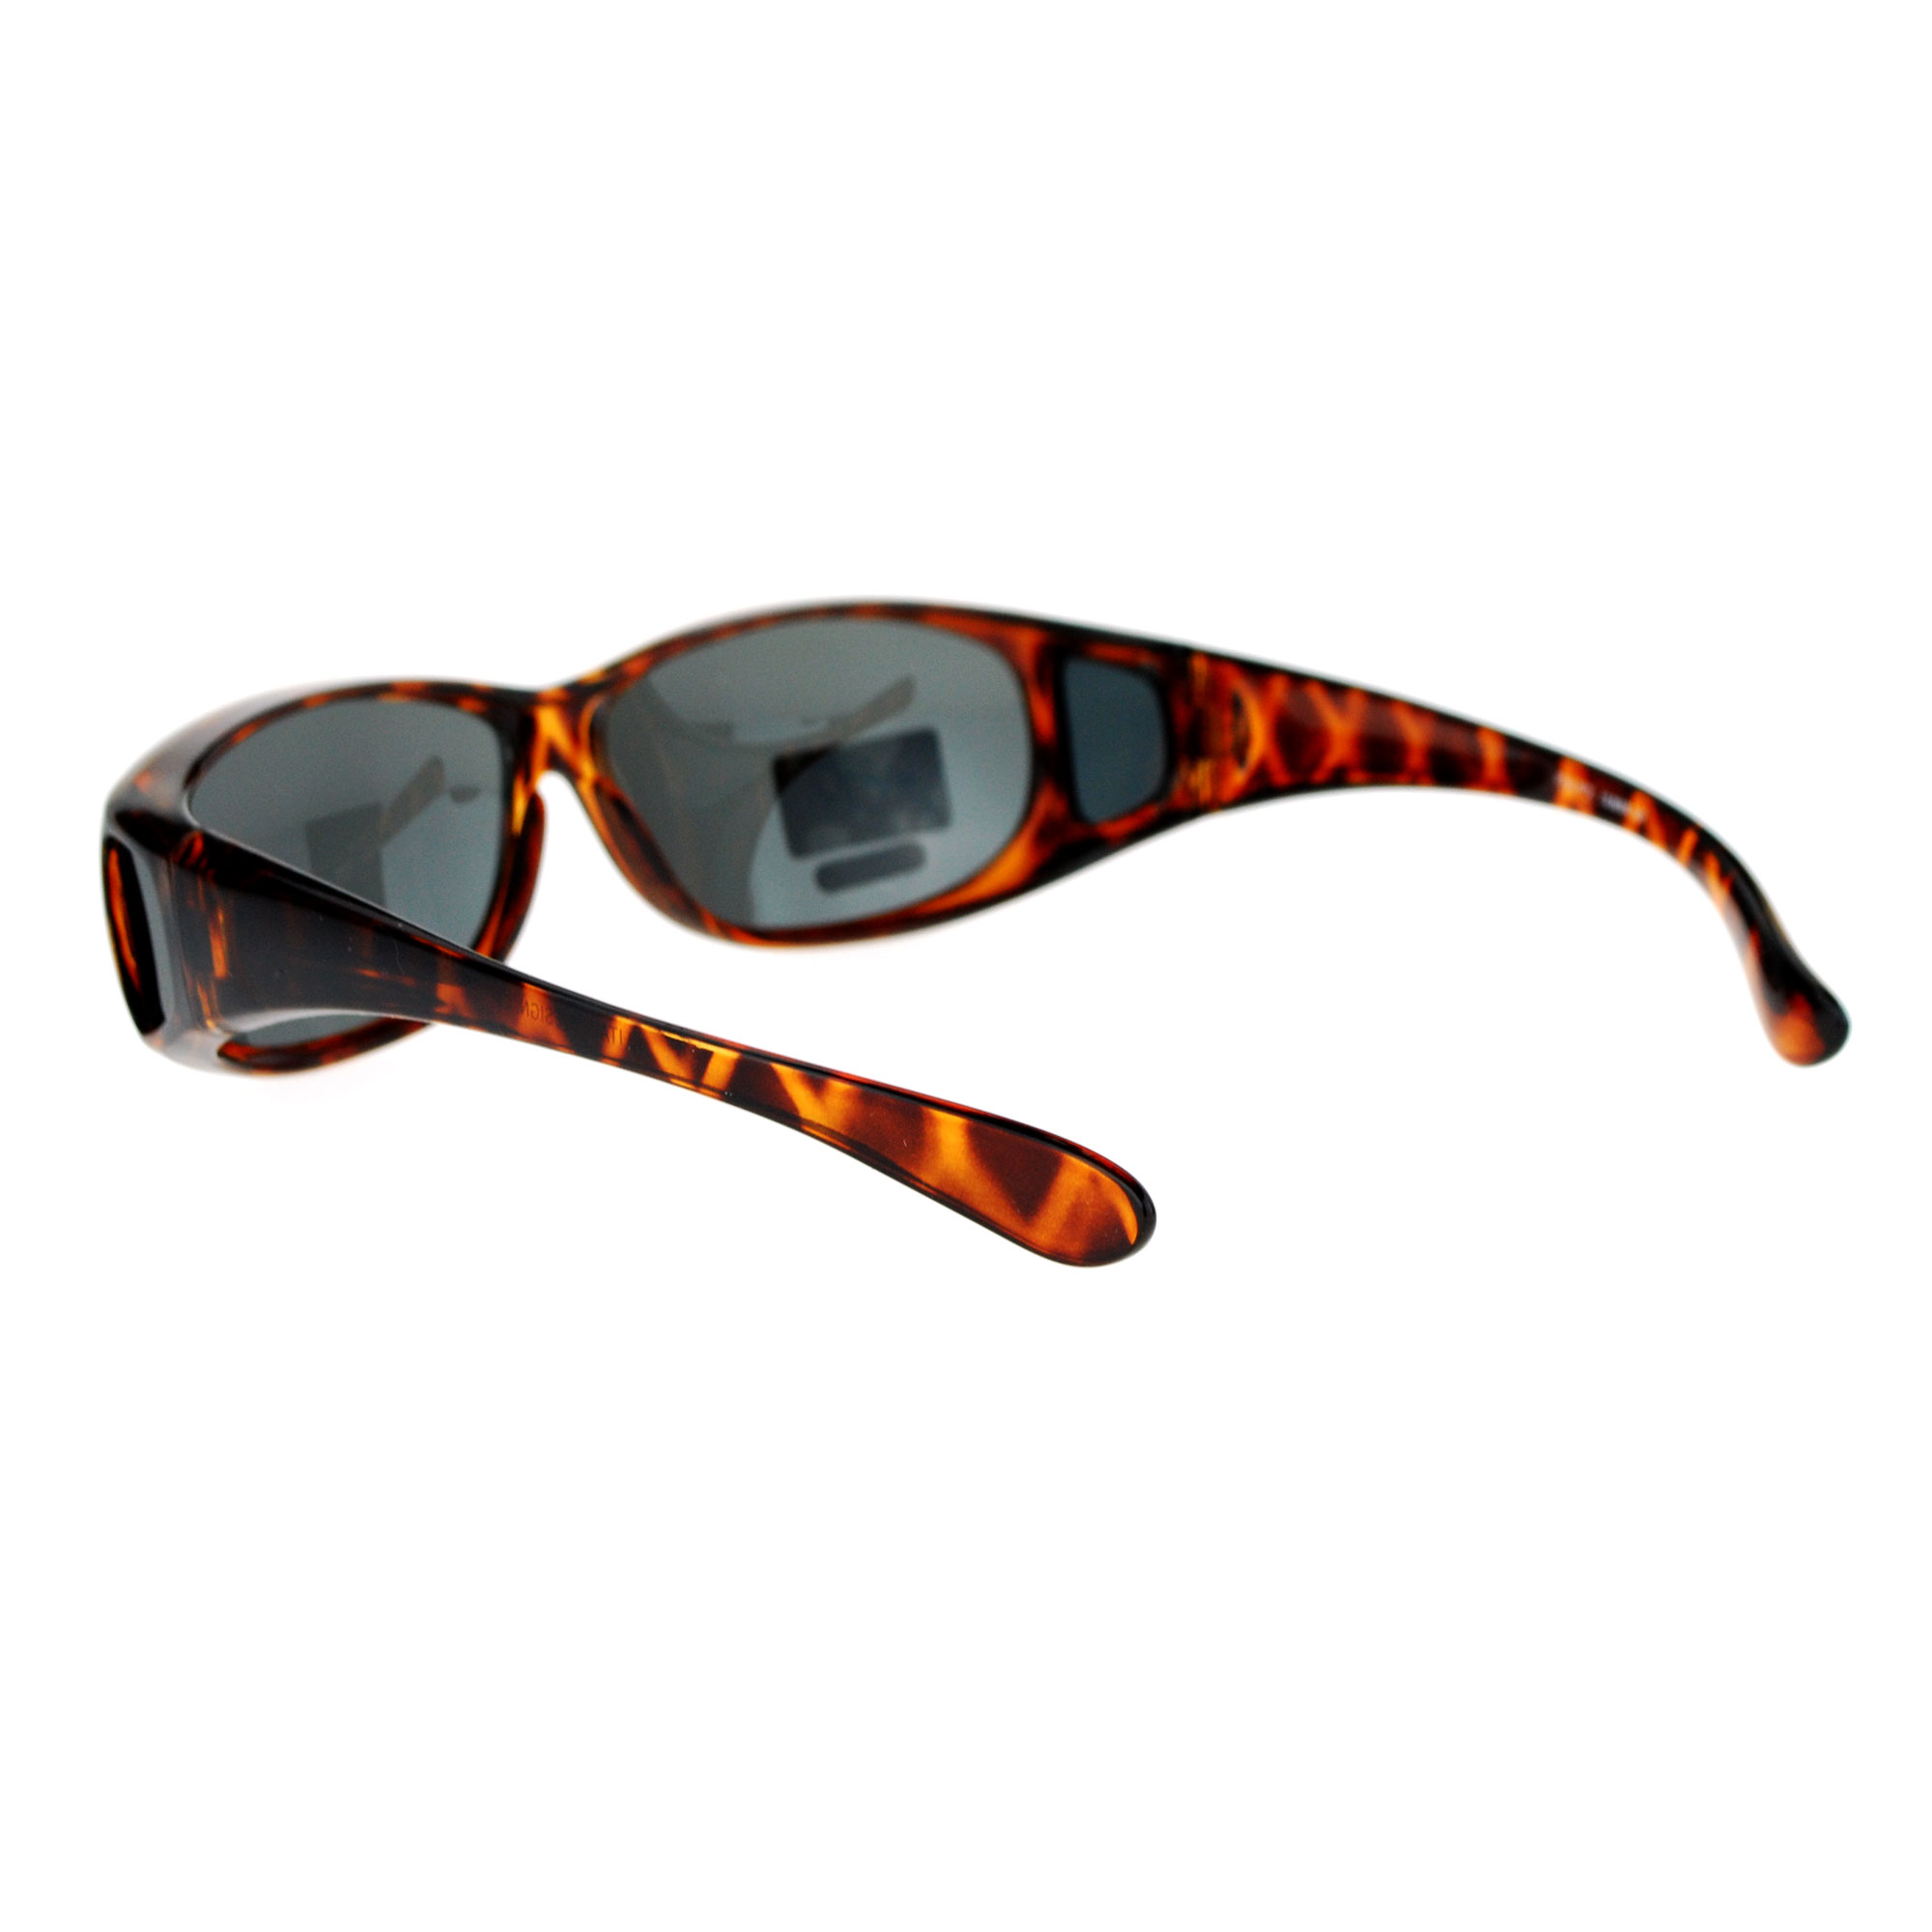 0d63a6319b Polarized Sunglasses Stop Glare